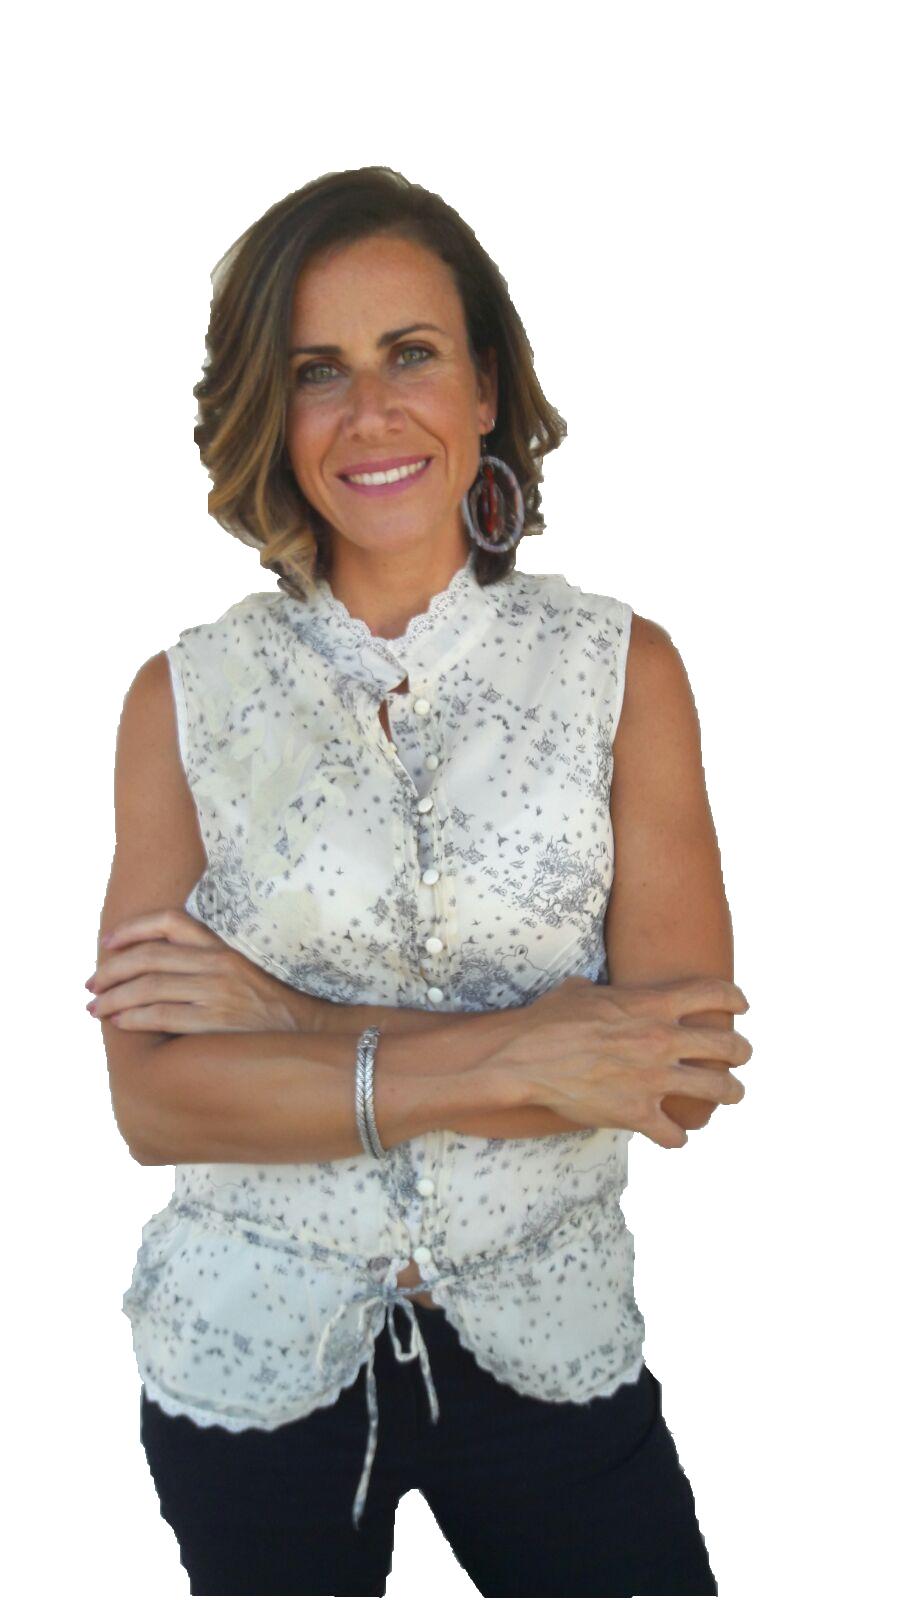 dott.ssa Marrone Psicoterapeuta Napoli